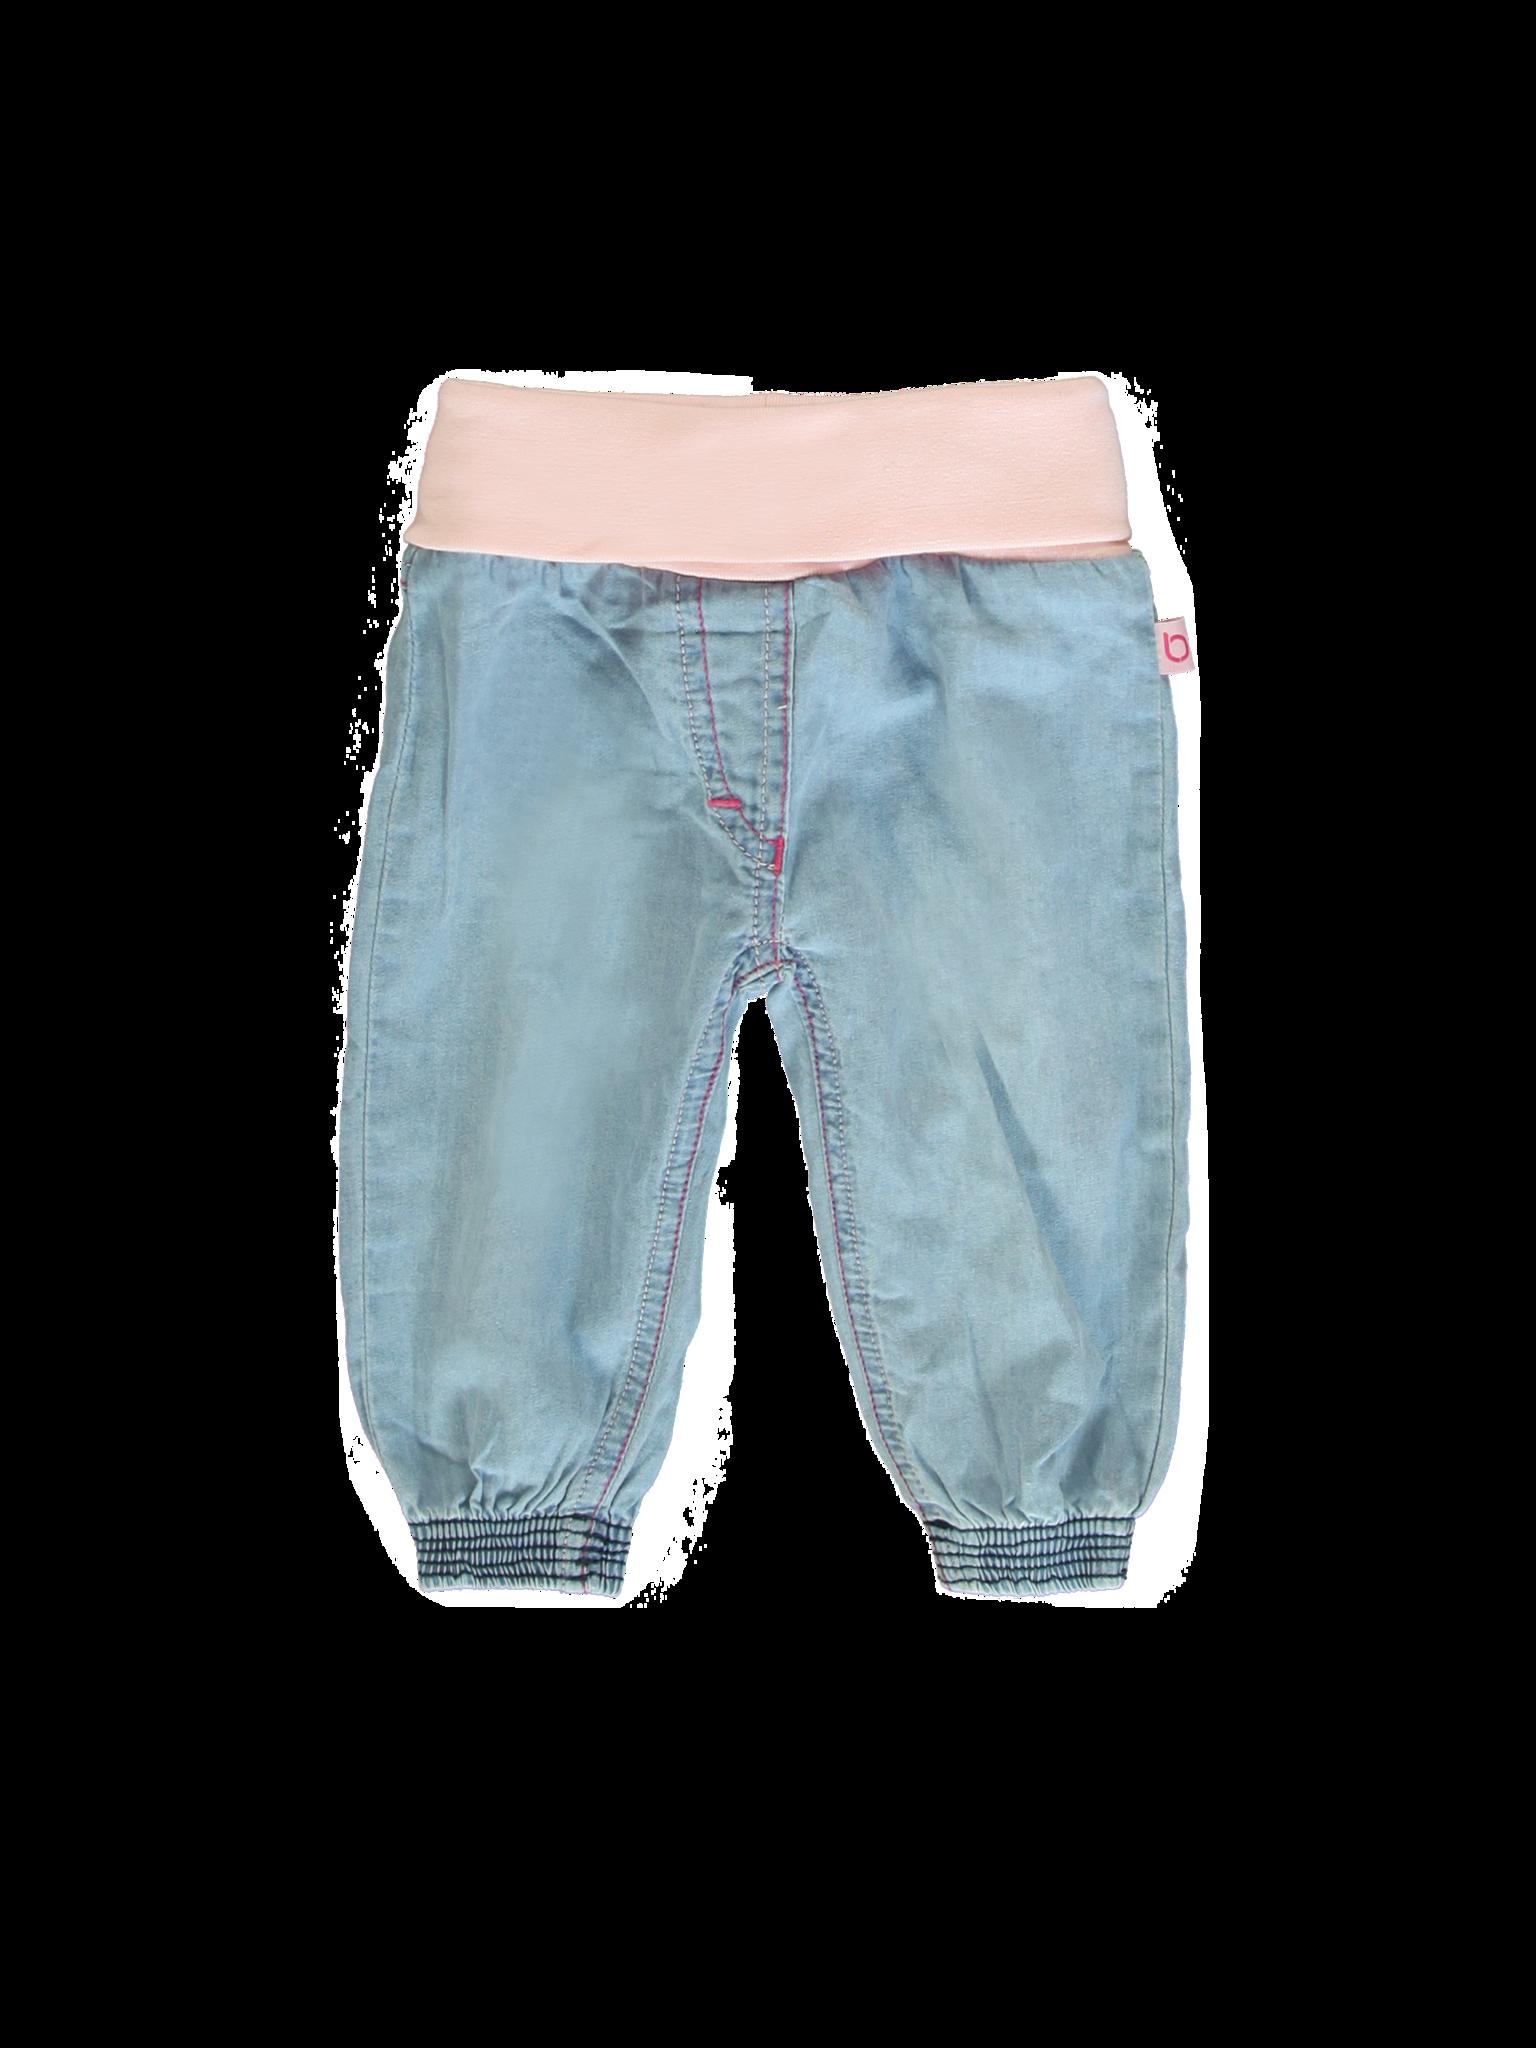 All Brands | Summerproducts Baby | Pant Denim | 8 pcs/box